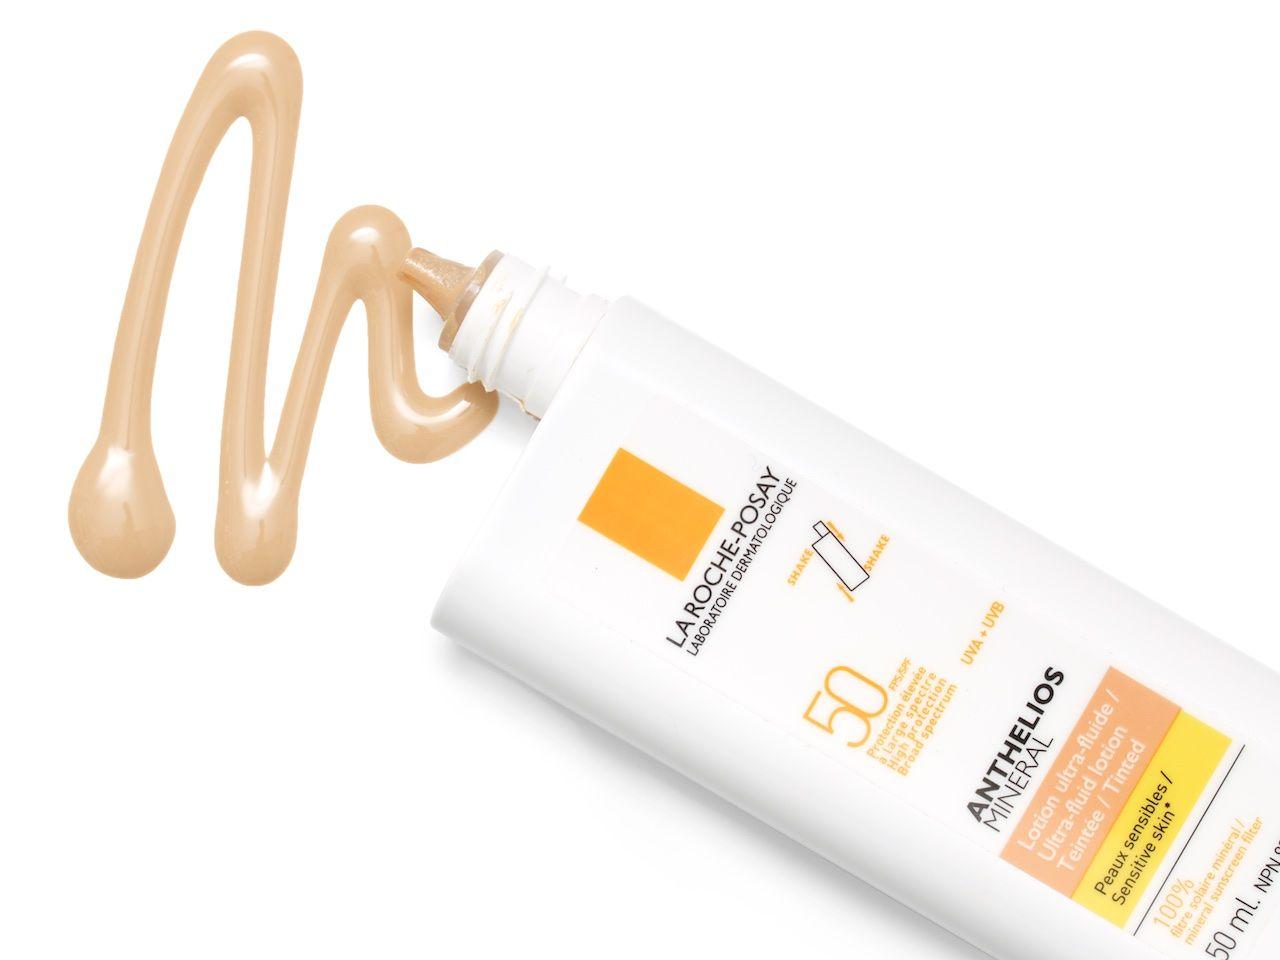 The Facial Sunscreen For Those Who Dislike Facial Sunscreen